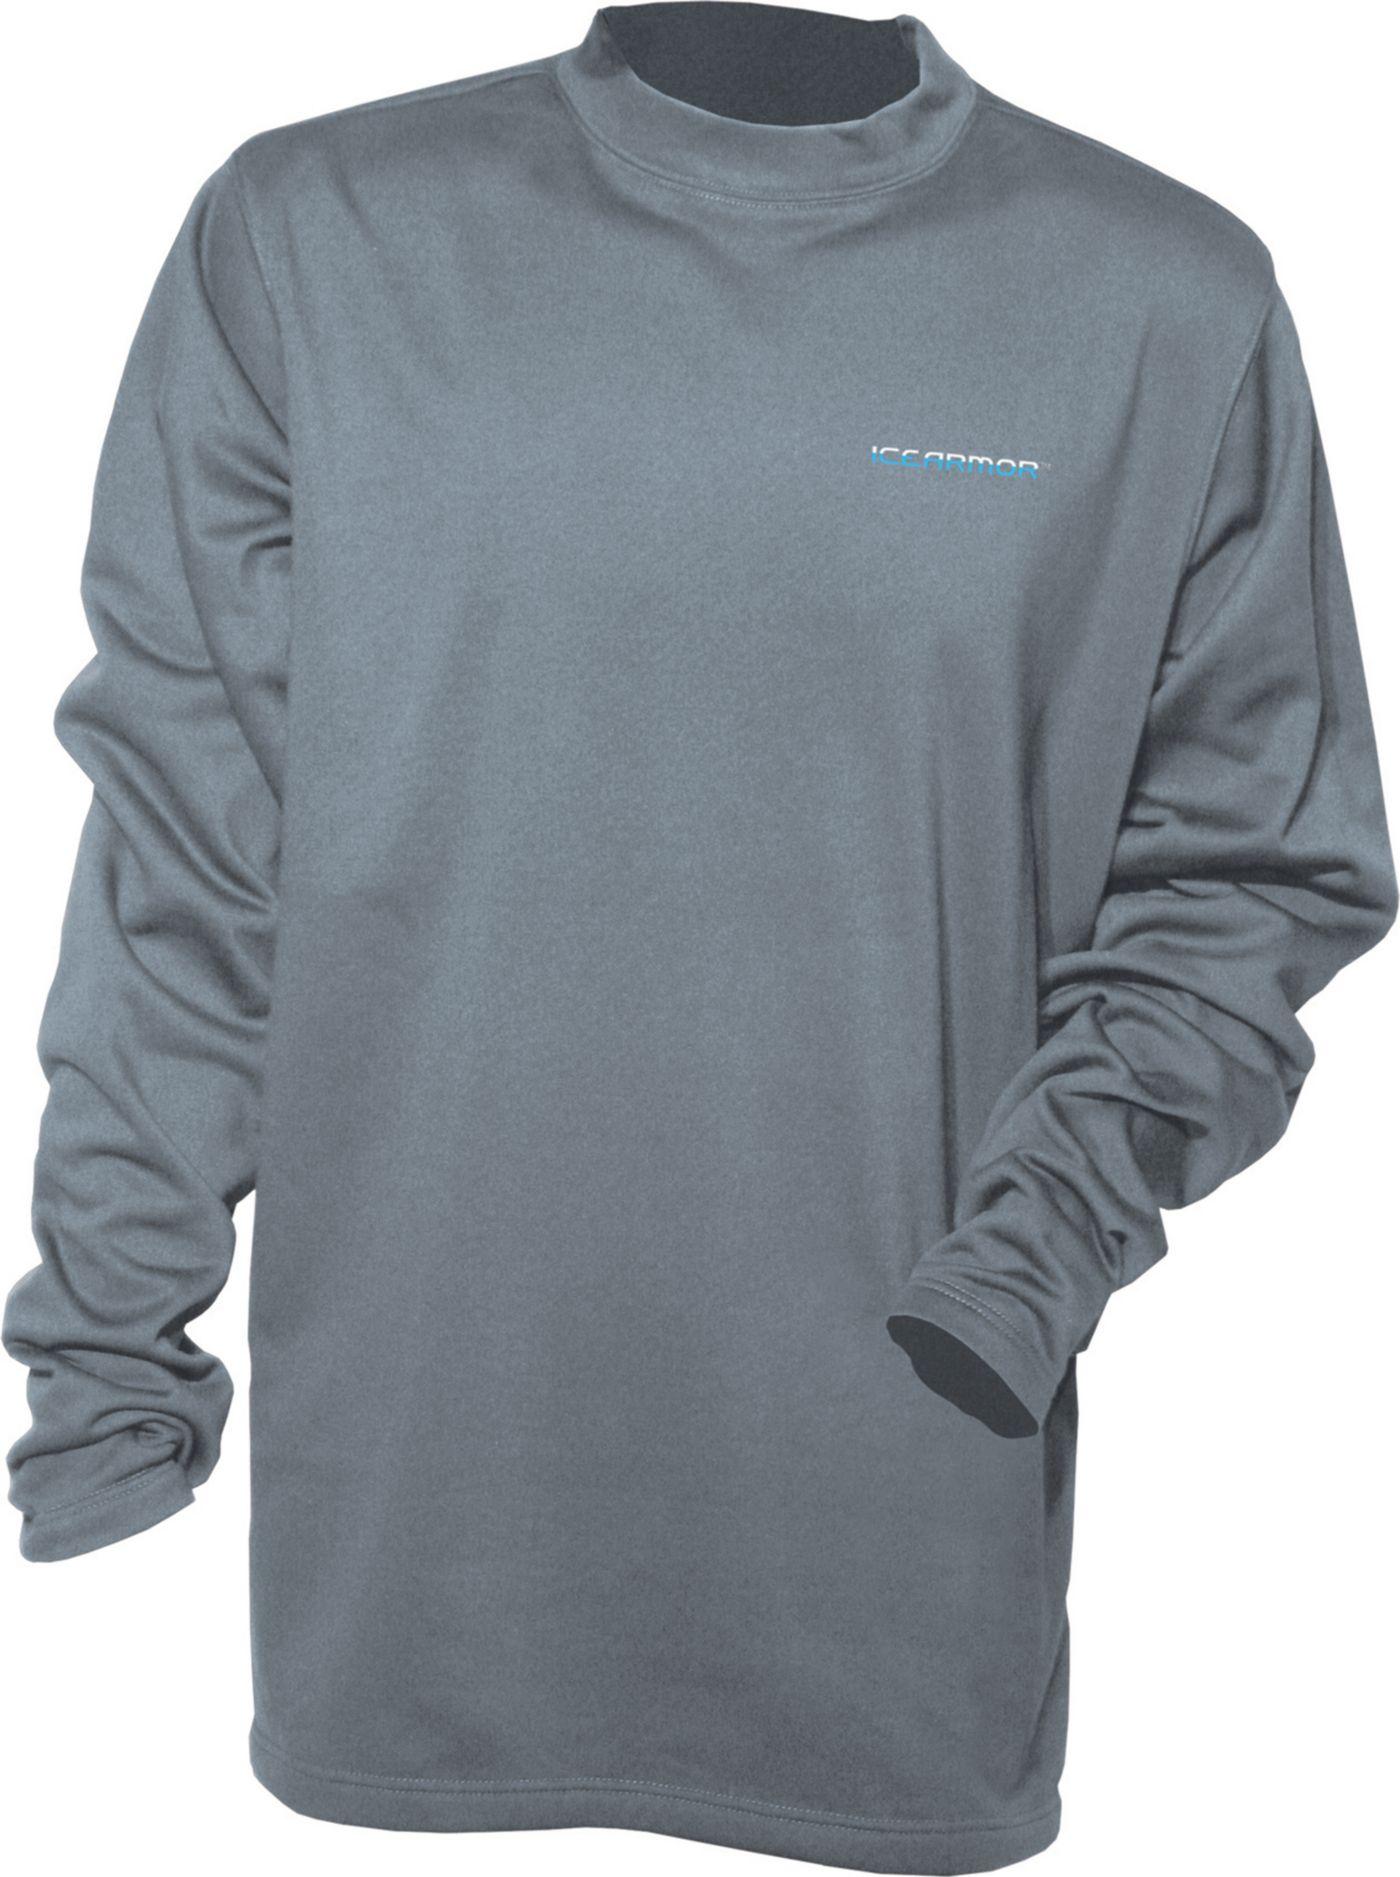 IceArmor Men's Poly Baselayer Shirt